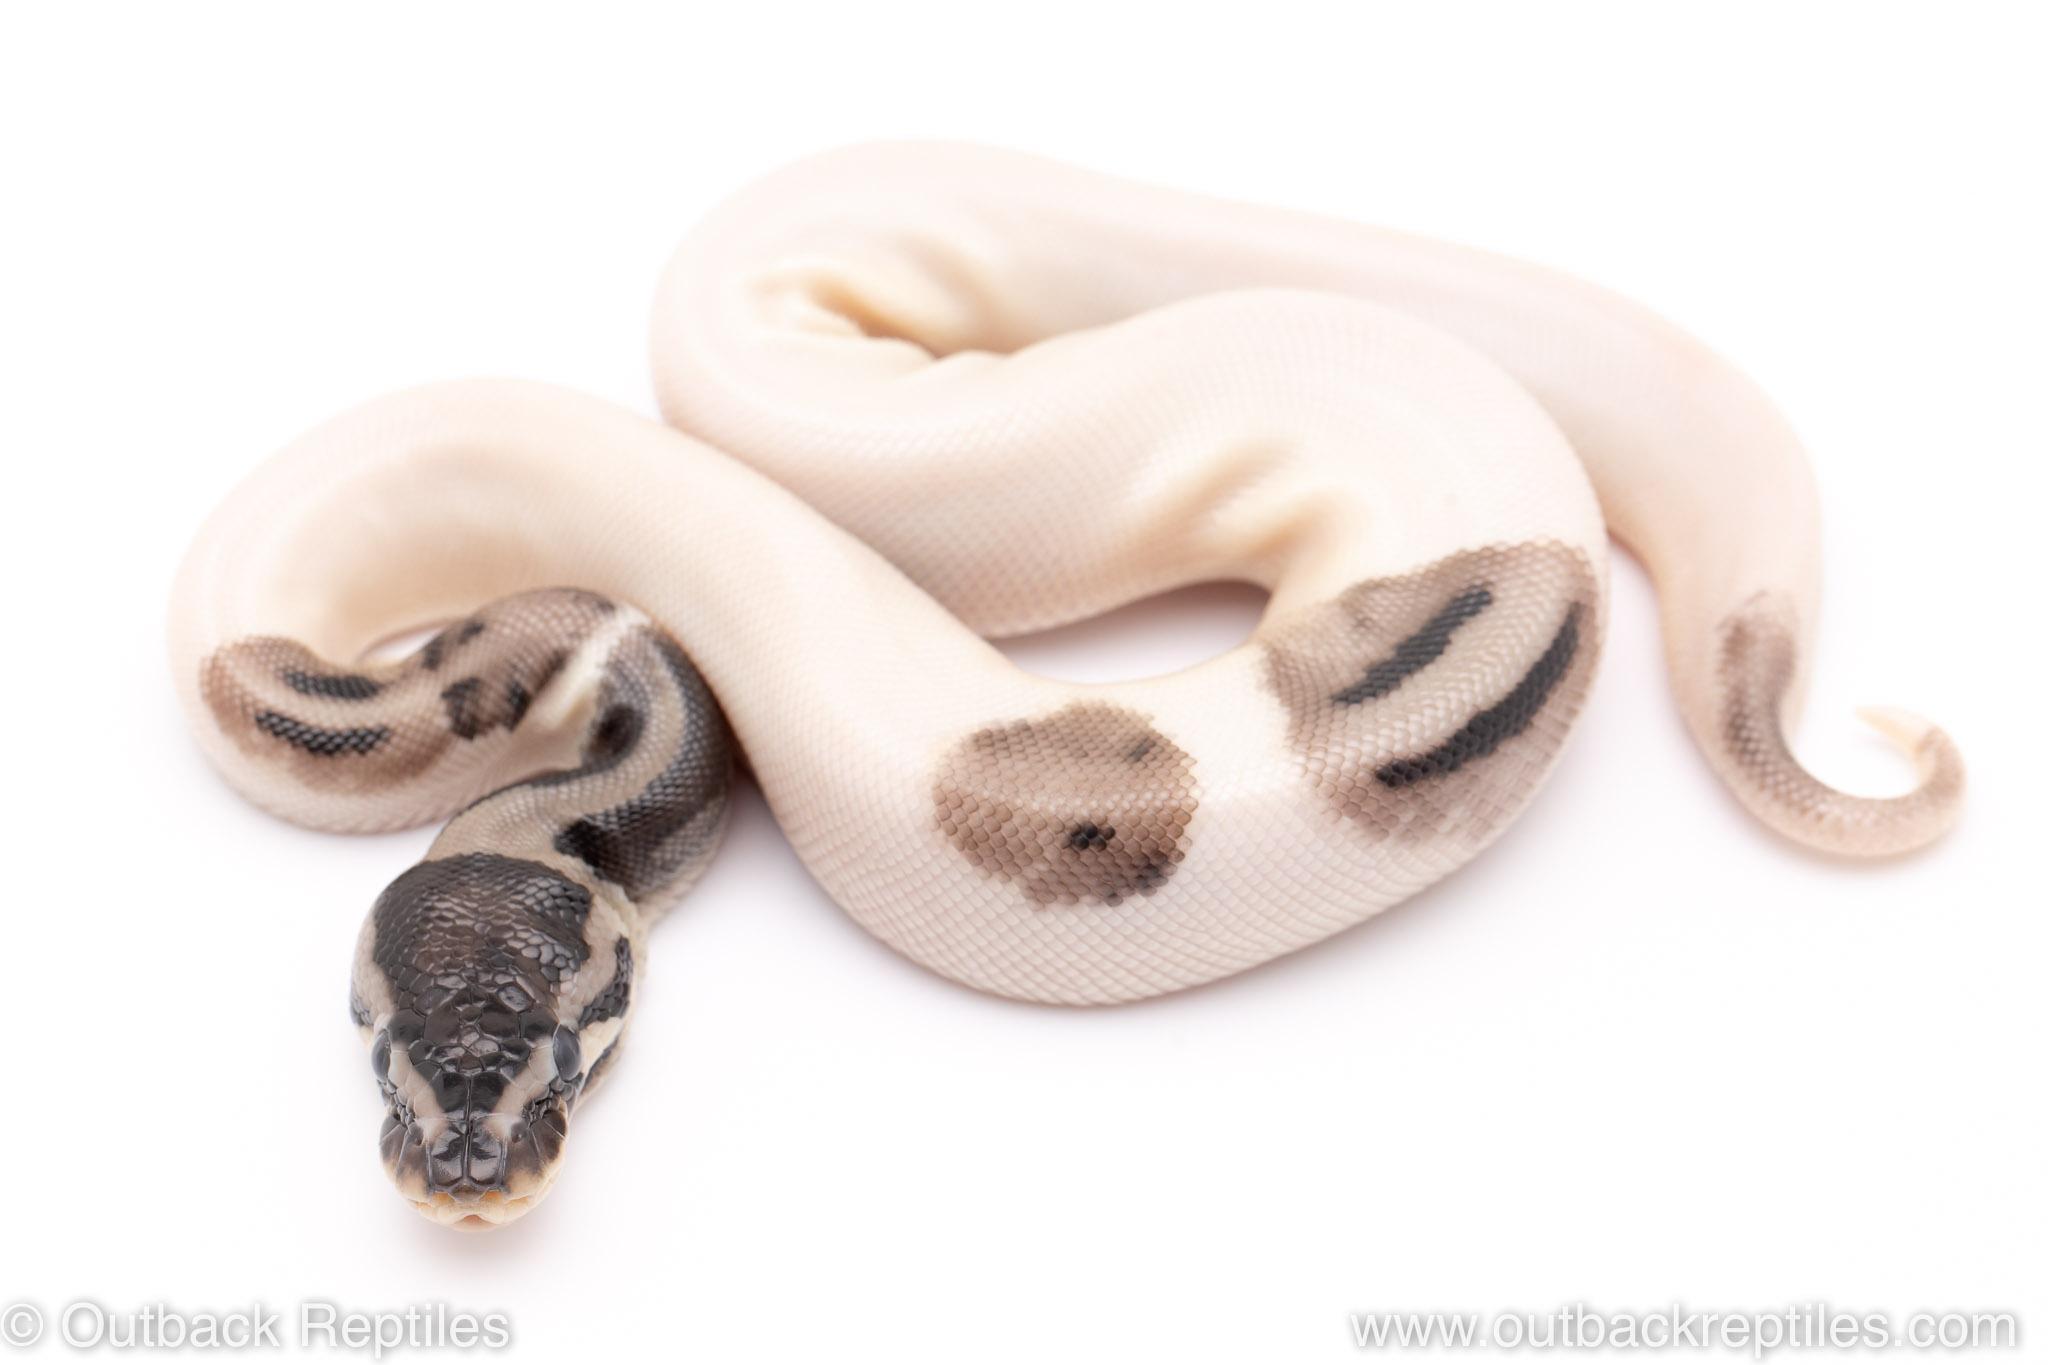 VPI Axanthic lightning pied ball python for sale